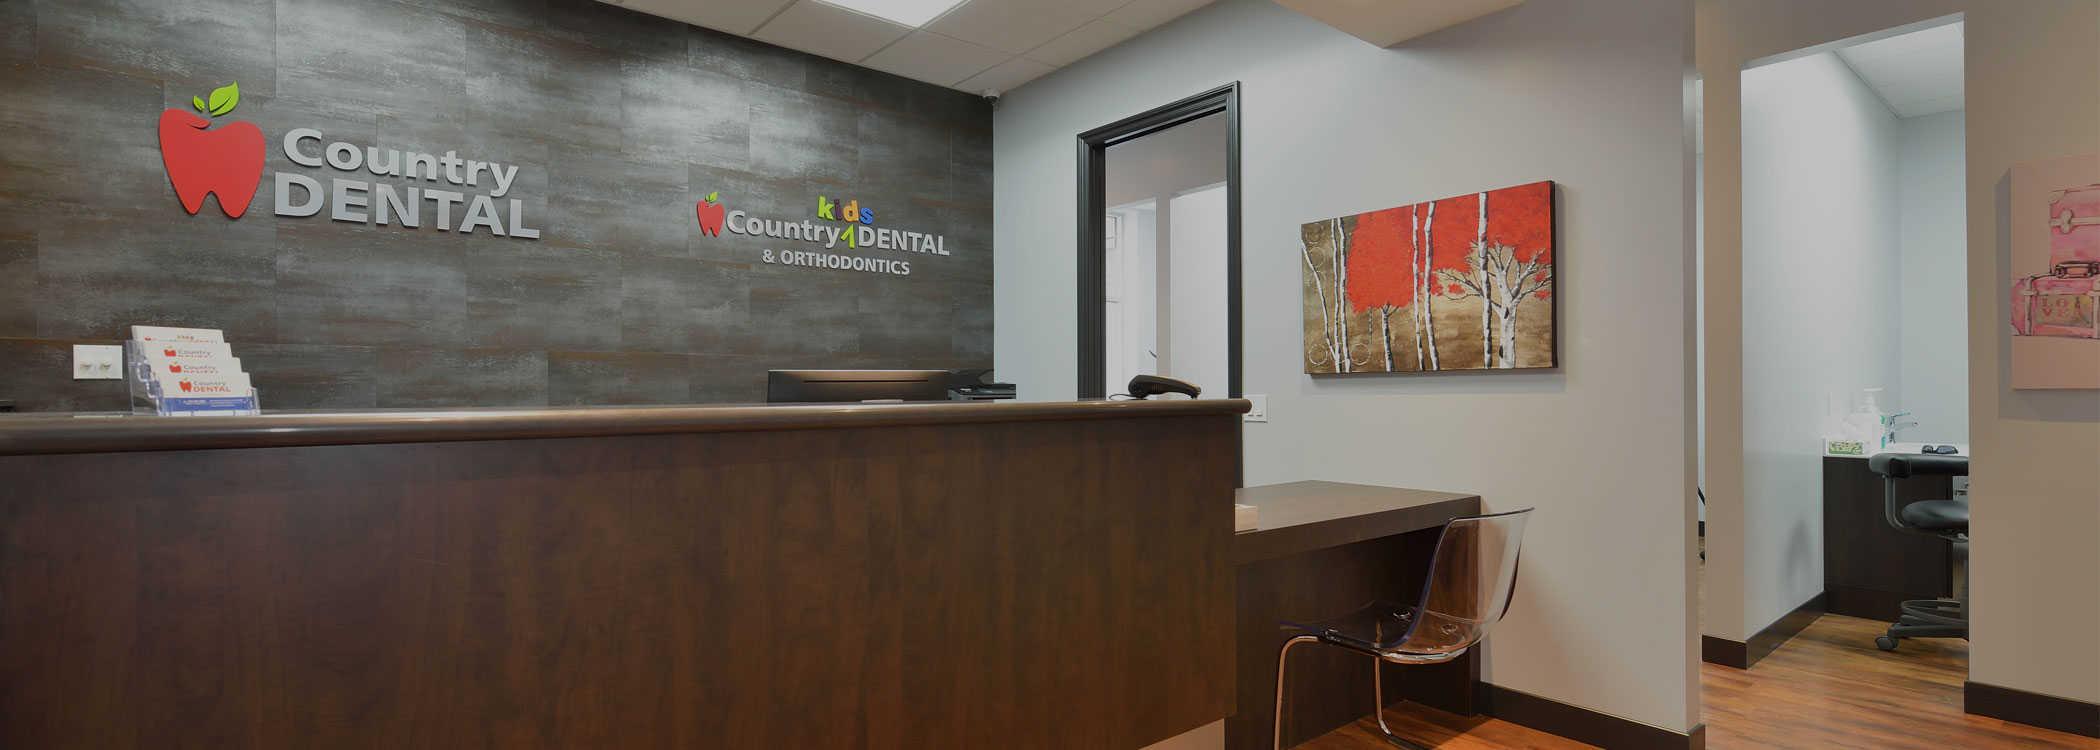 Fergus Dental Clinic – Family and Pediatric Dentists